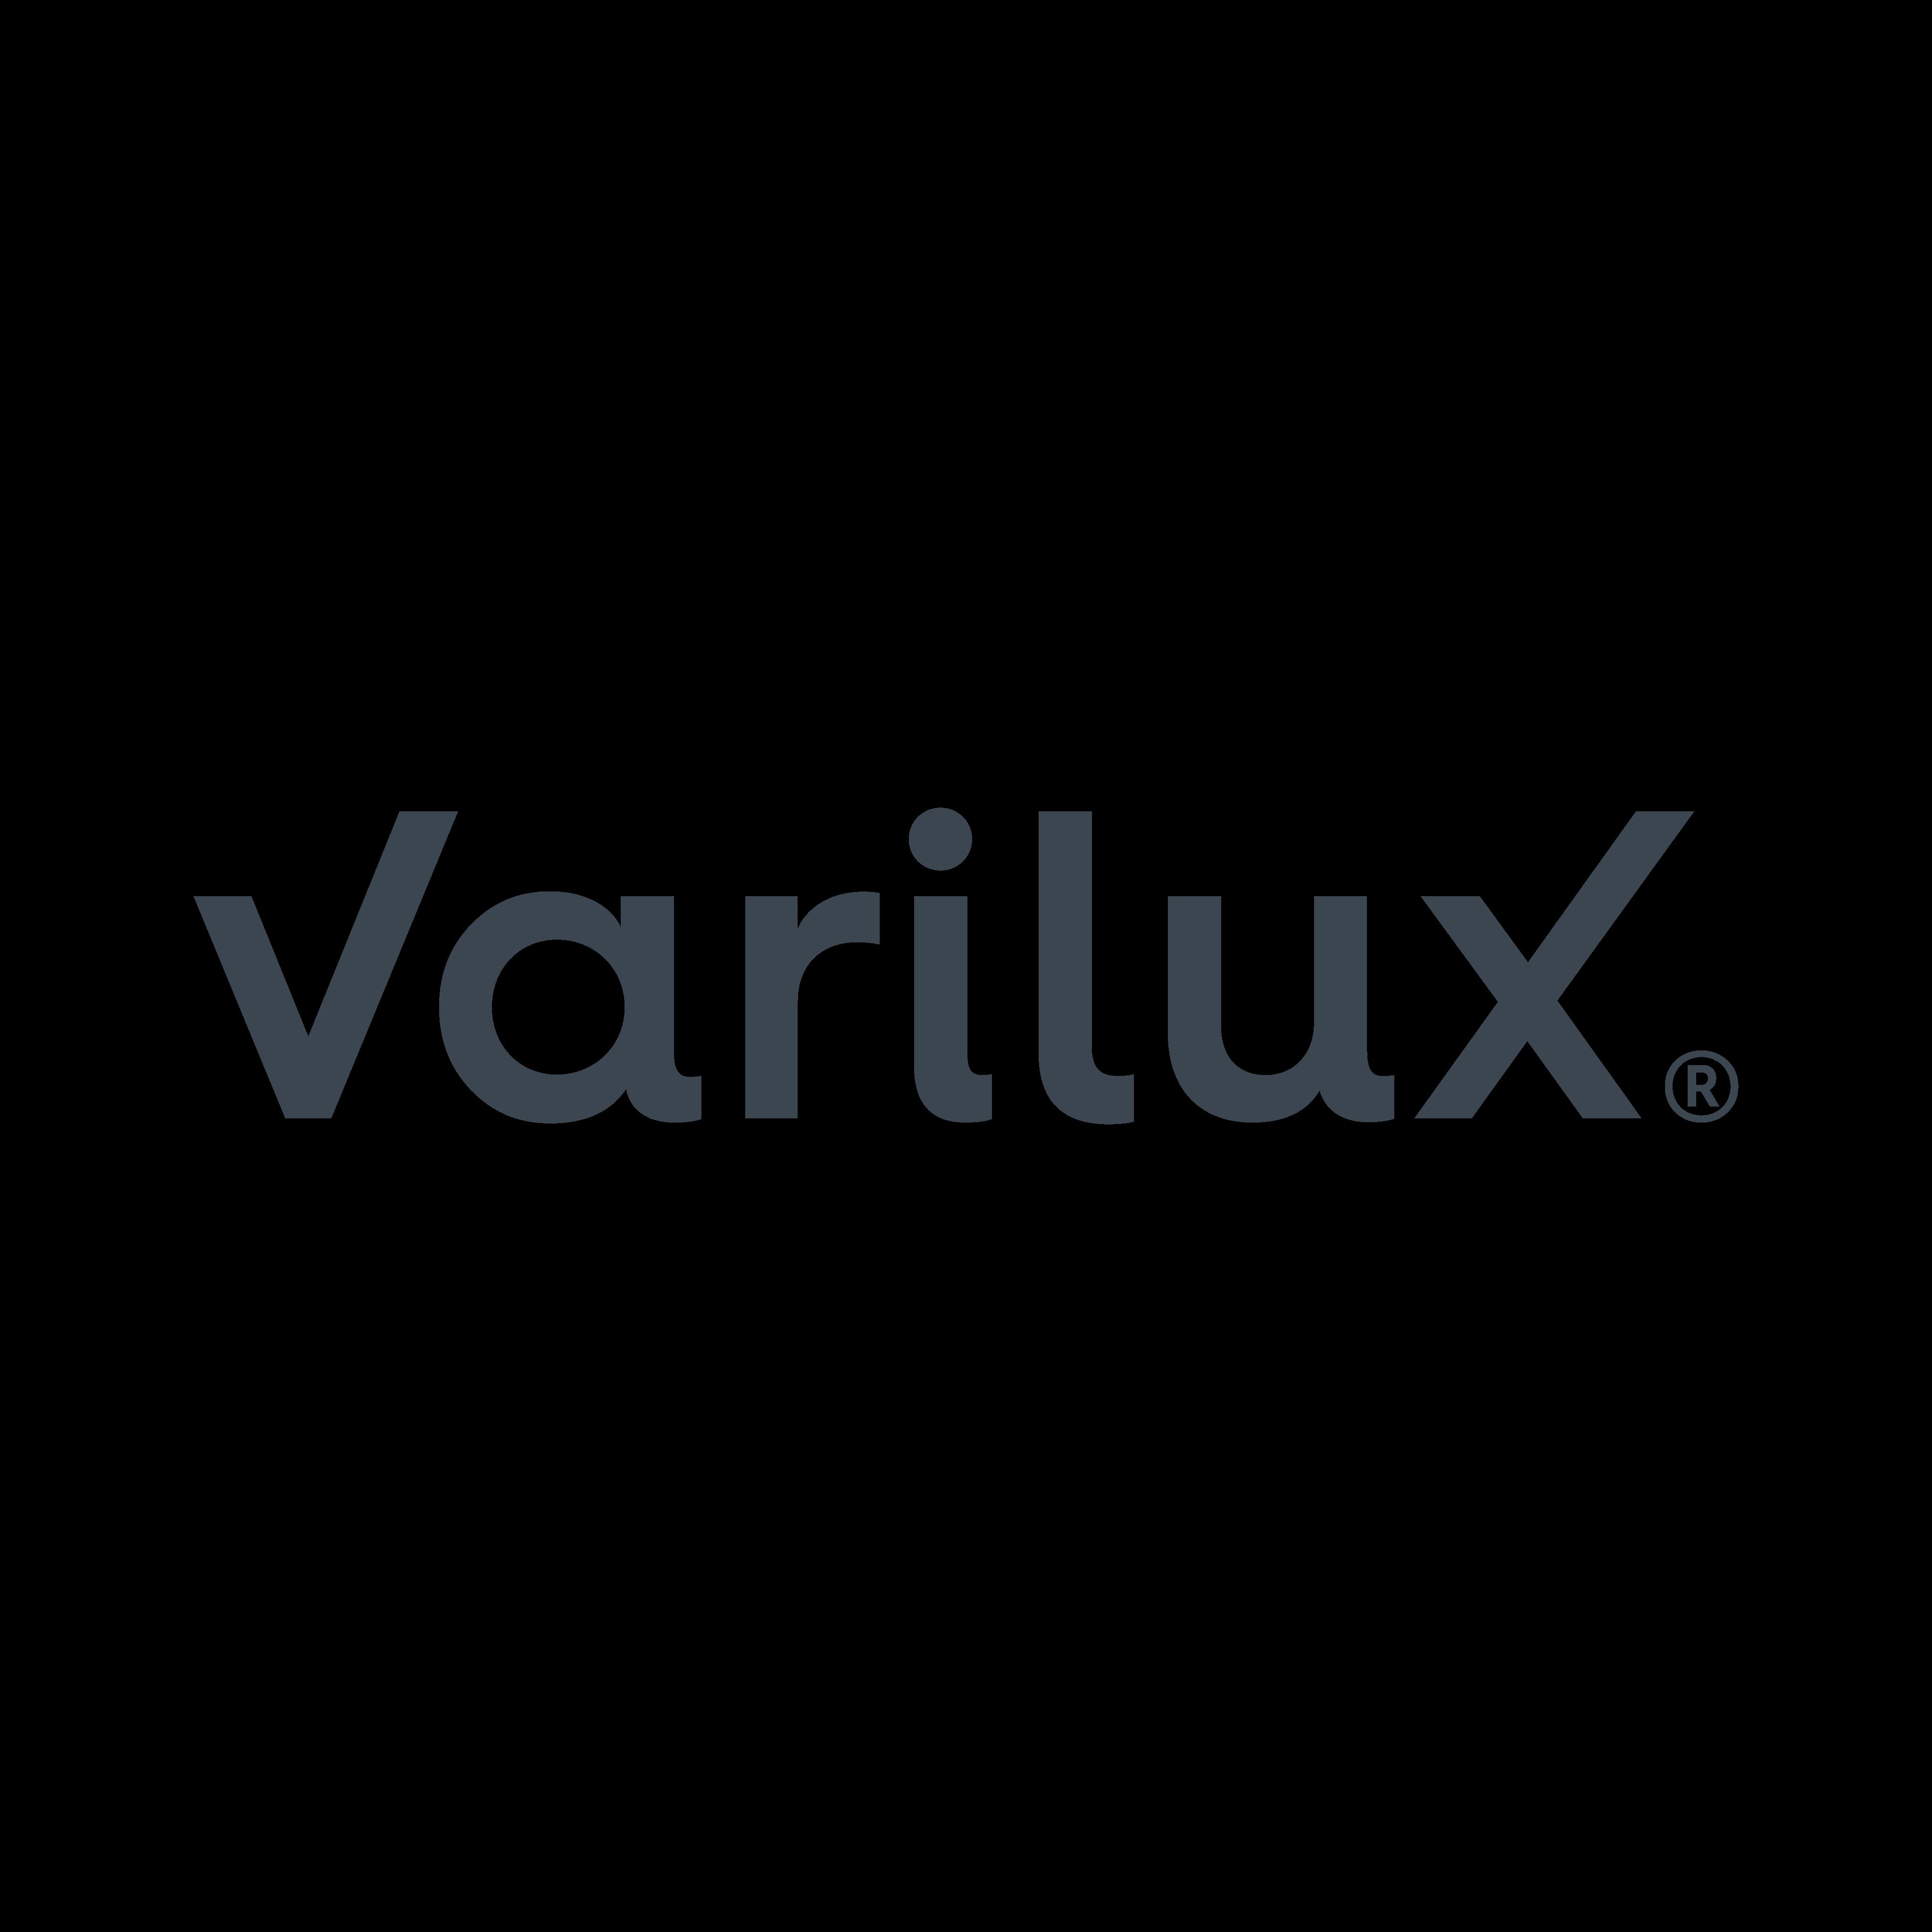 varilux logo 0 - Varilux Logo